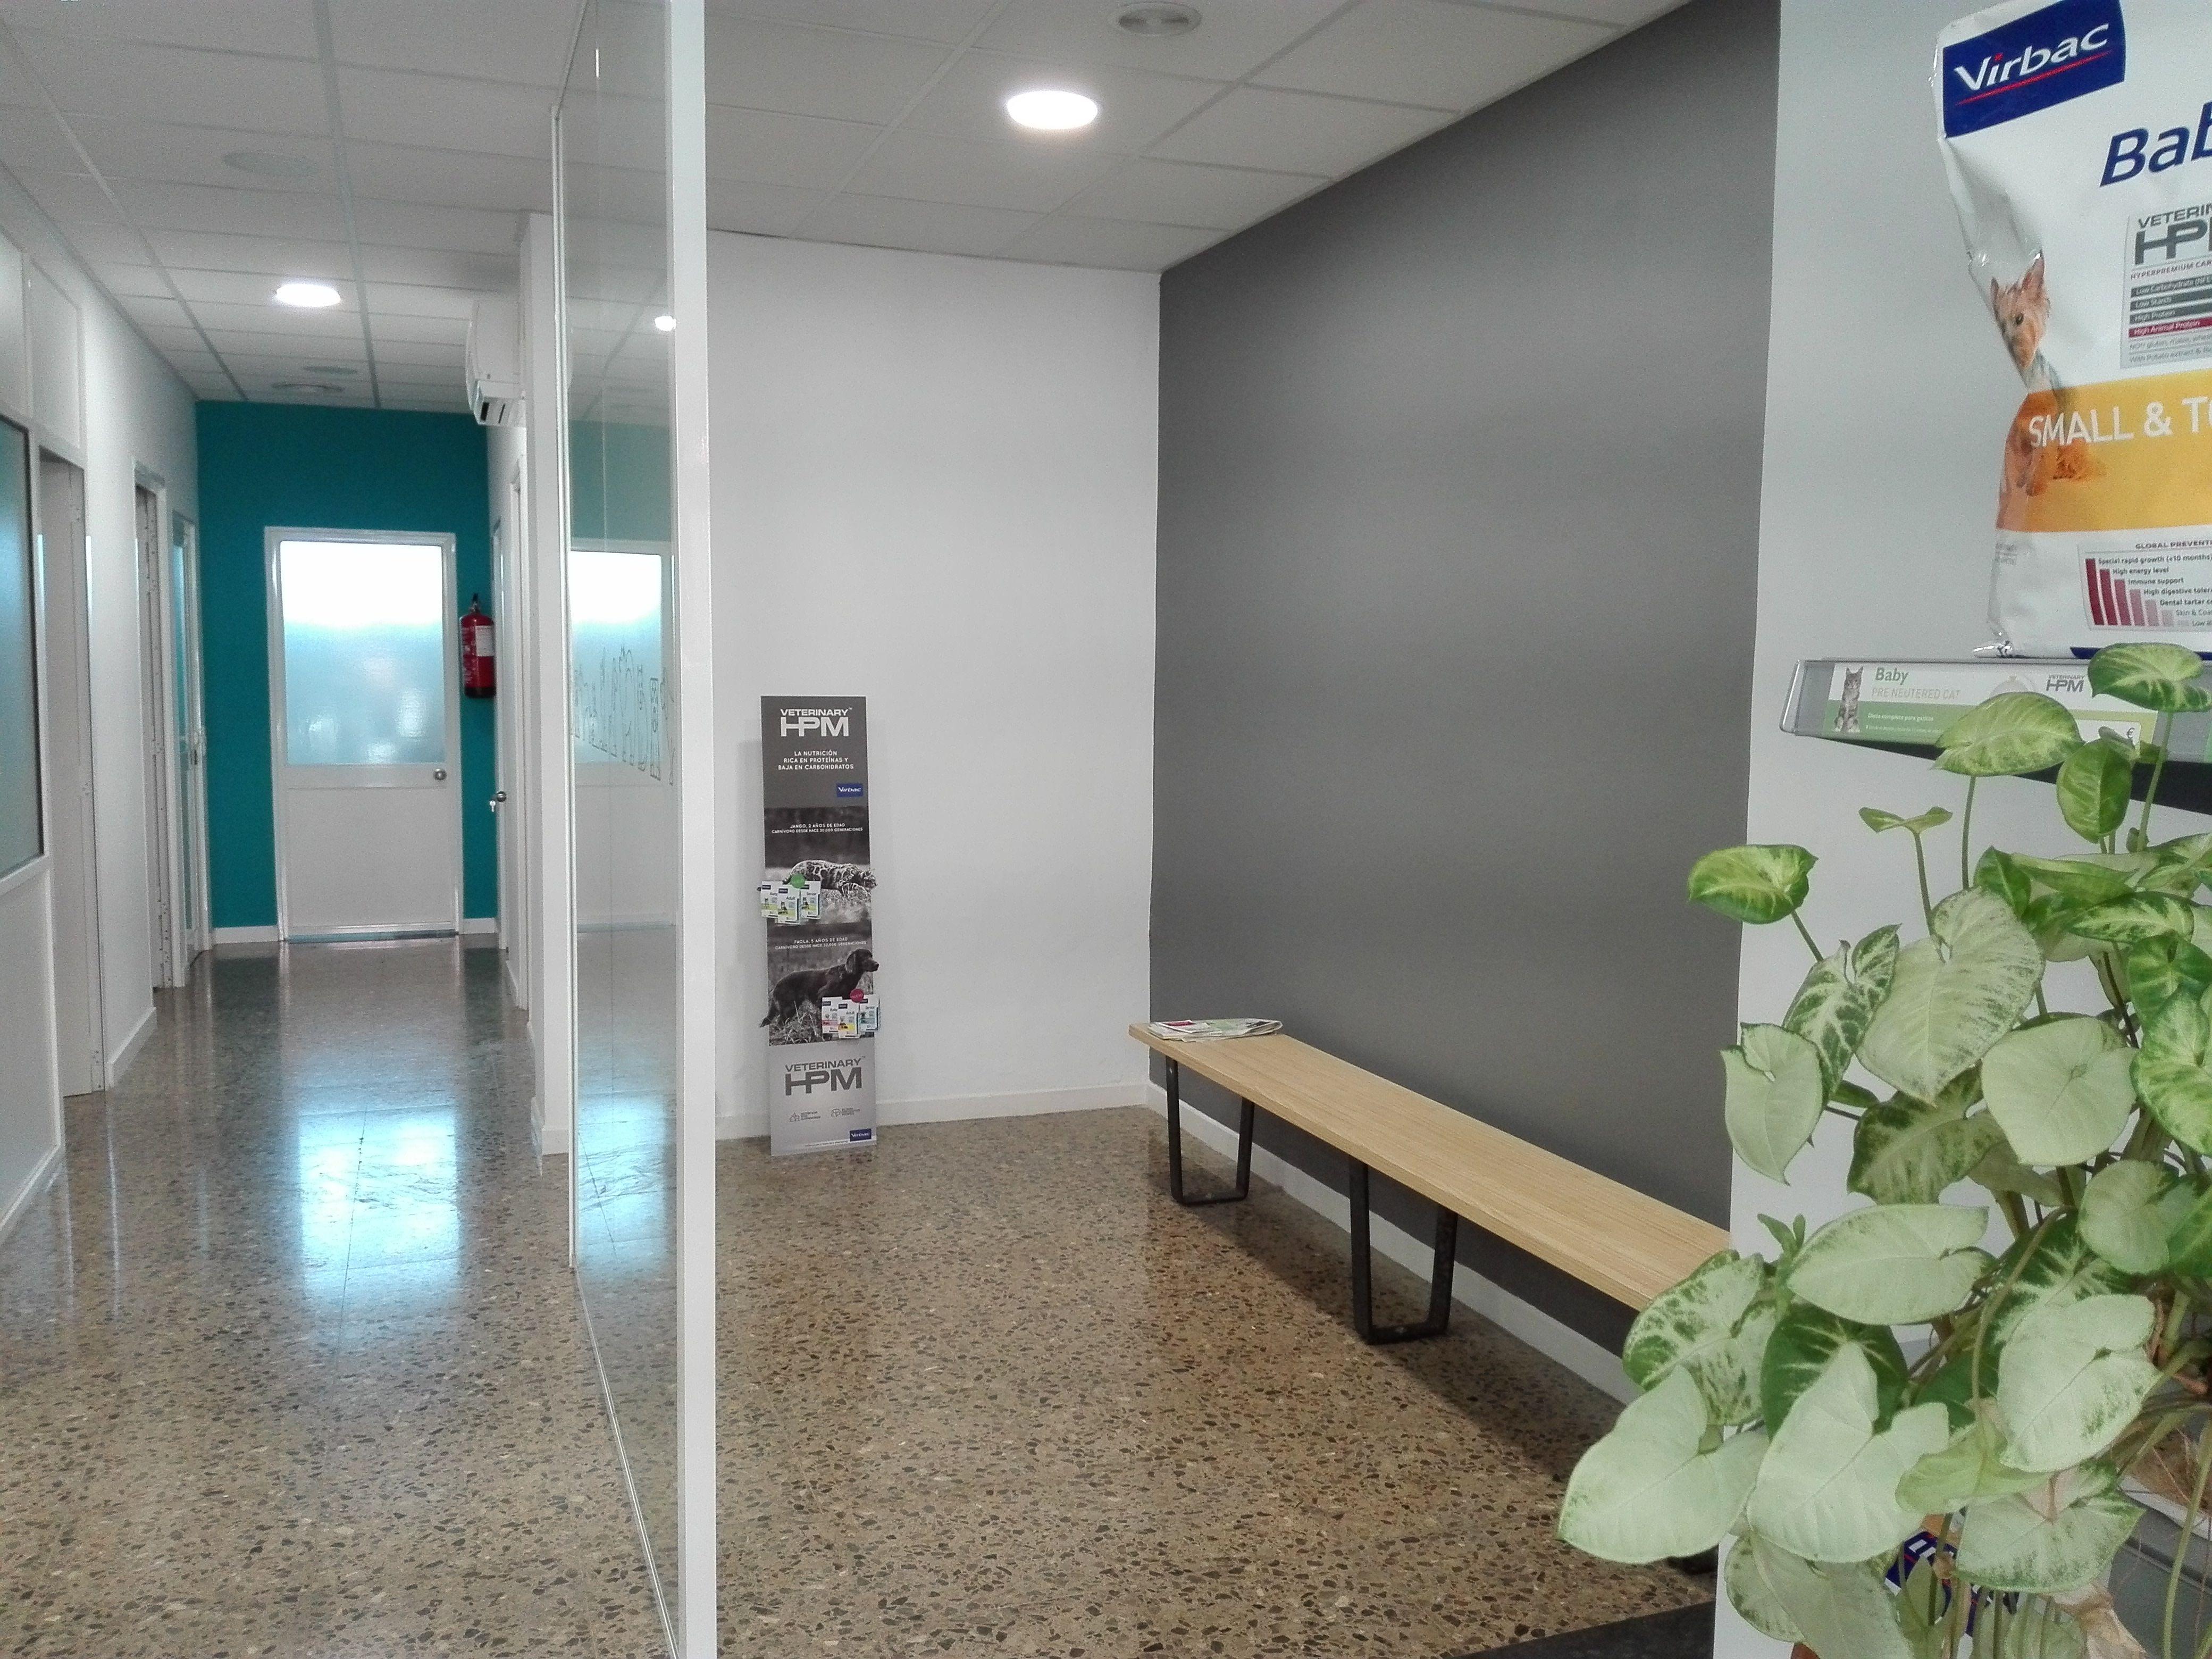 Foto 22 de Veterinarios en Sant Sadurní d'Anoia | Veterinaria Animavet